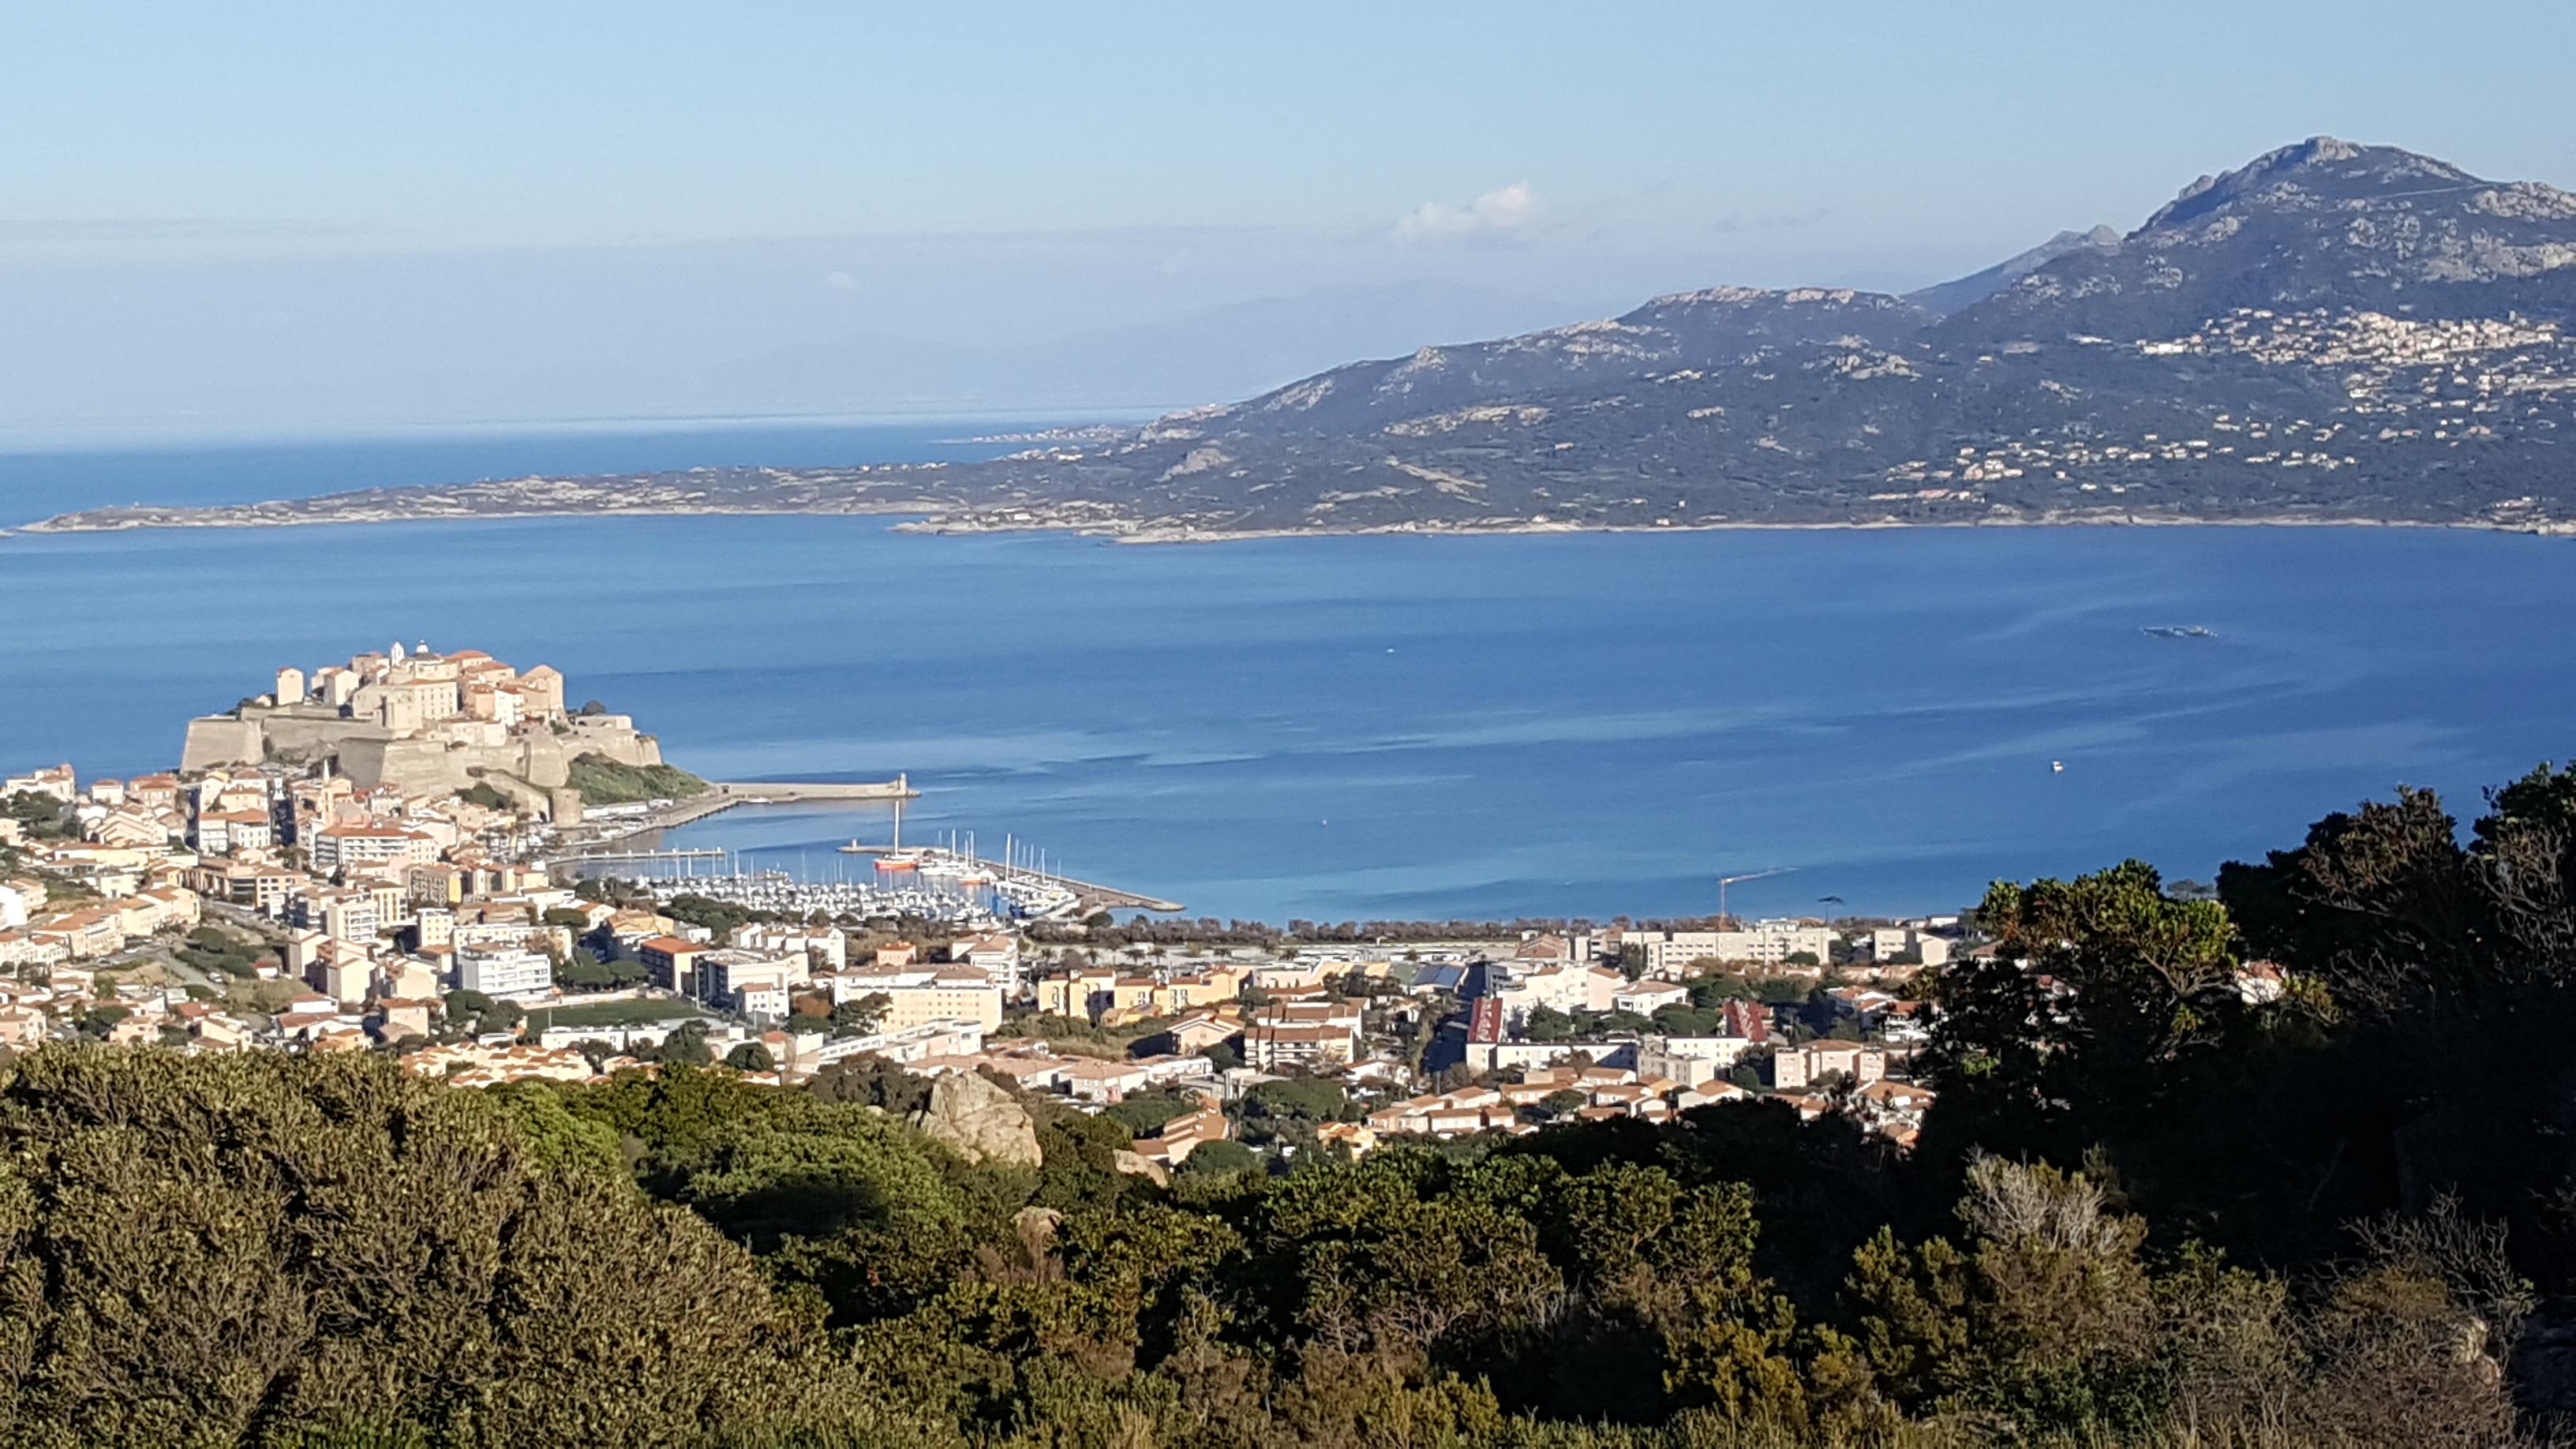 File:CALVI, CORSE.jpg - Wikimedia Commons